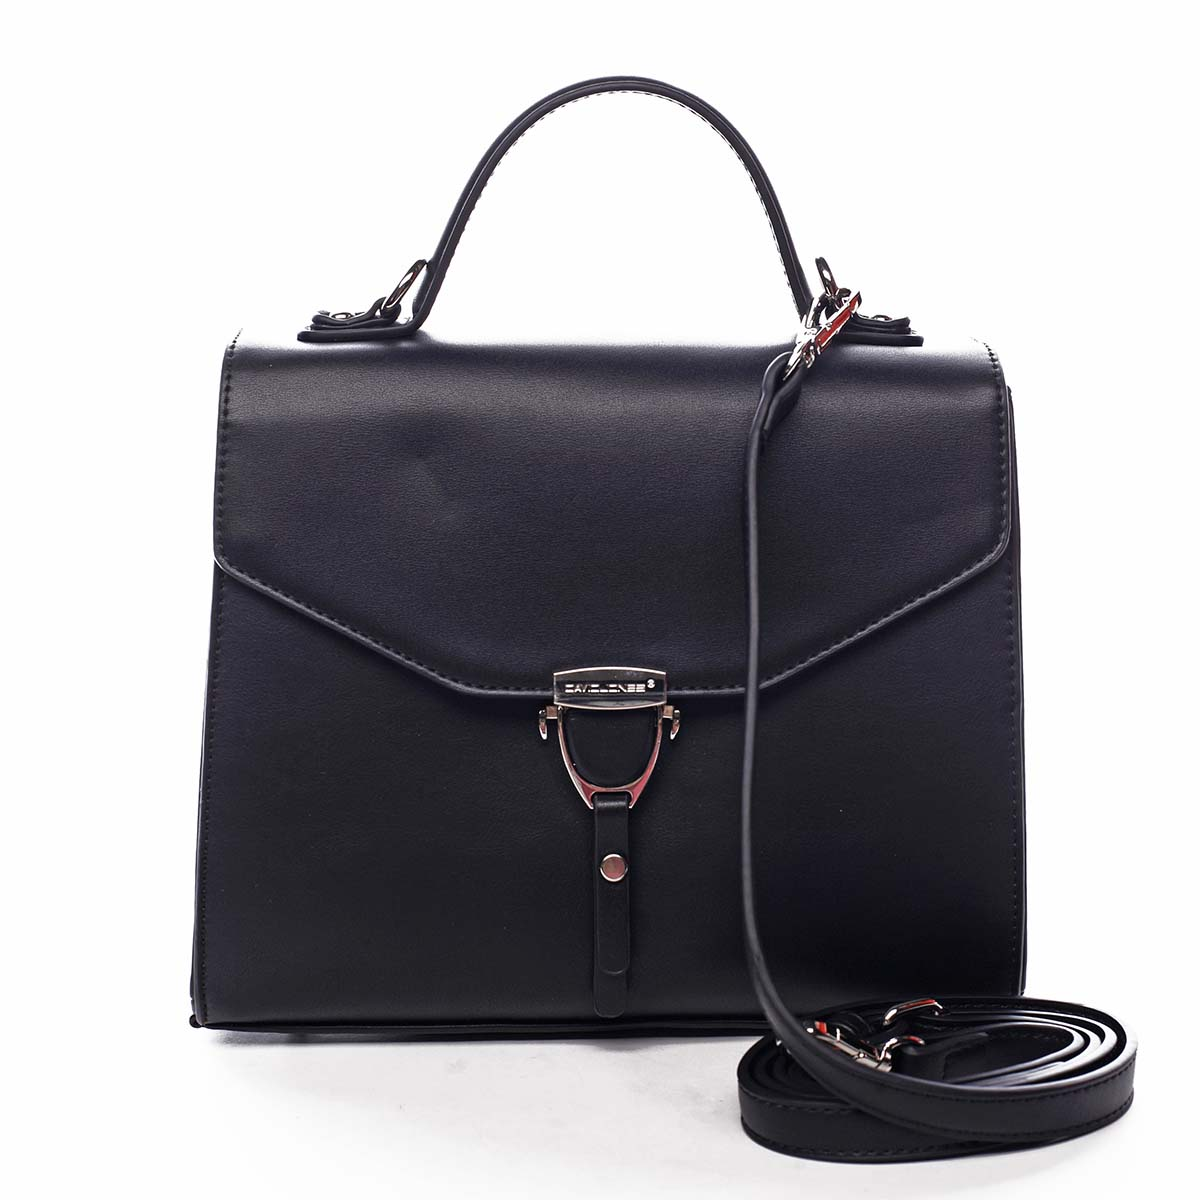 Dámska kabelka do ruky čierna - David Jones California čierna